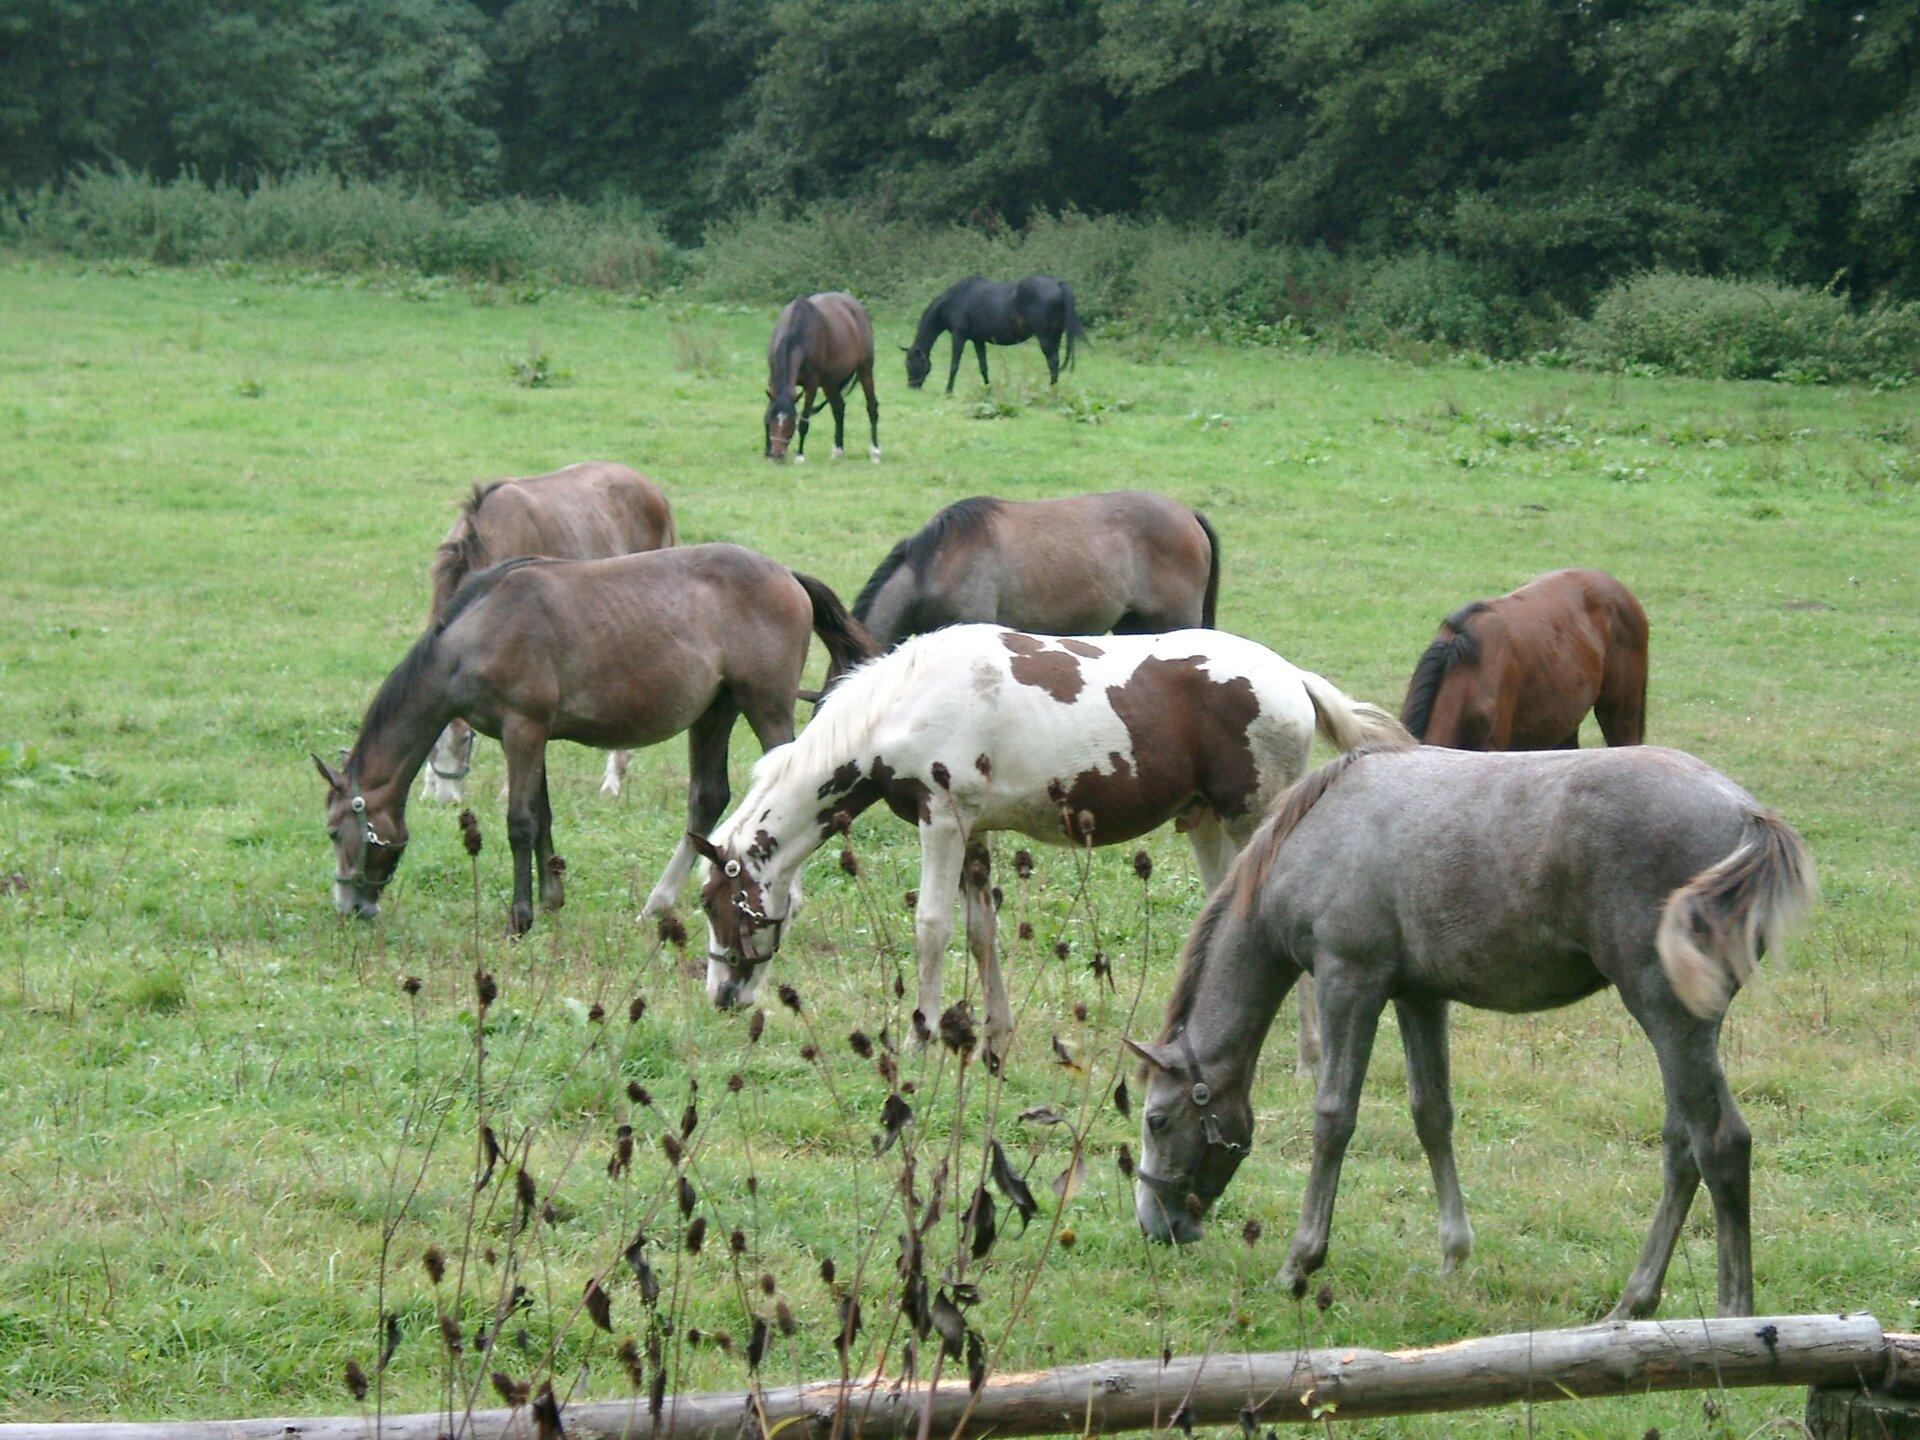 Na zdjęciu stado koni na pastwisku pod lasem.